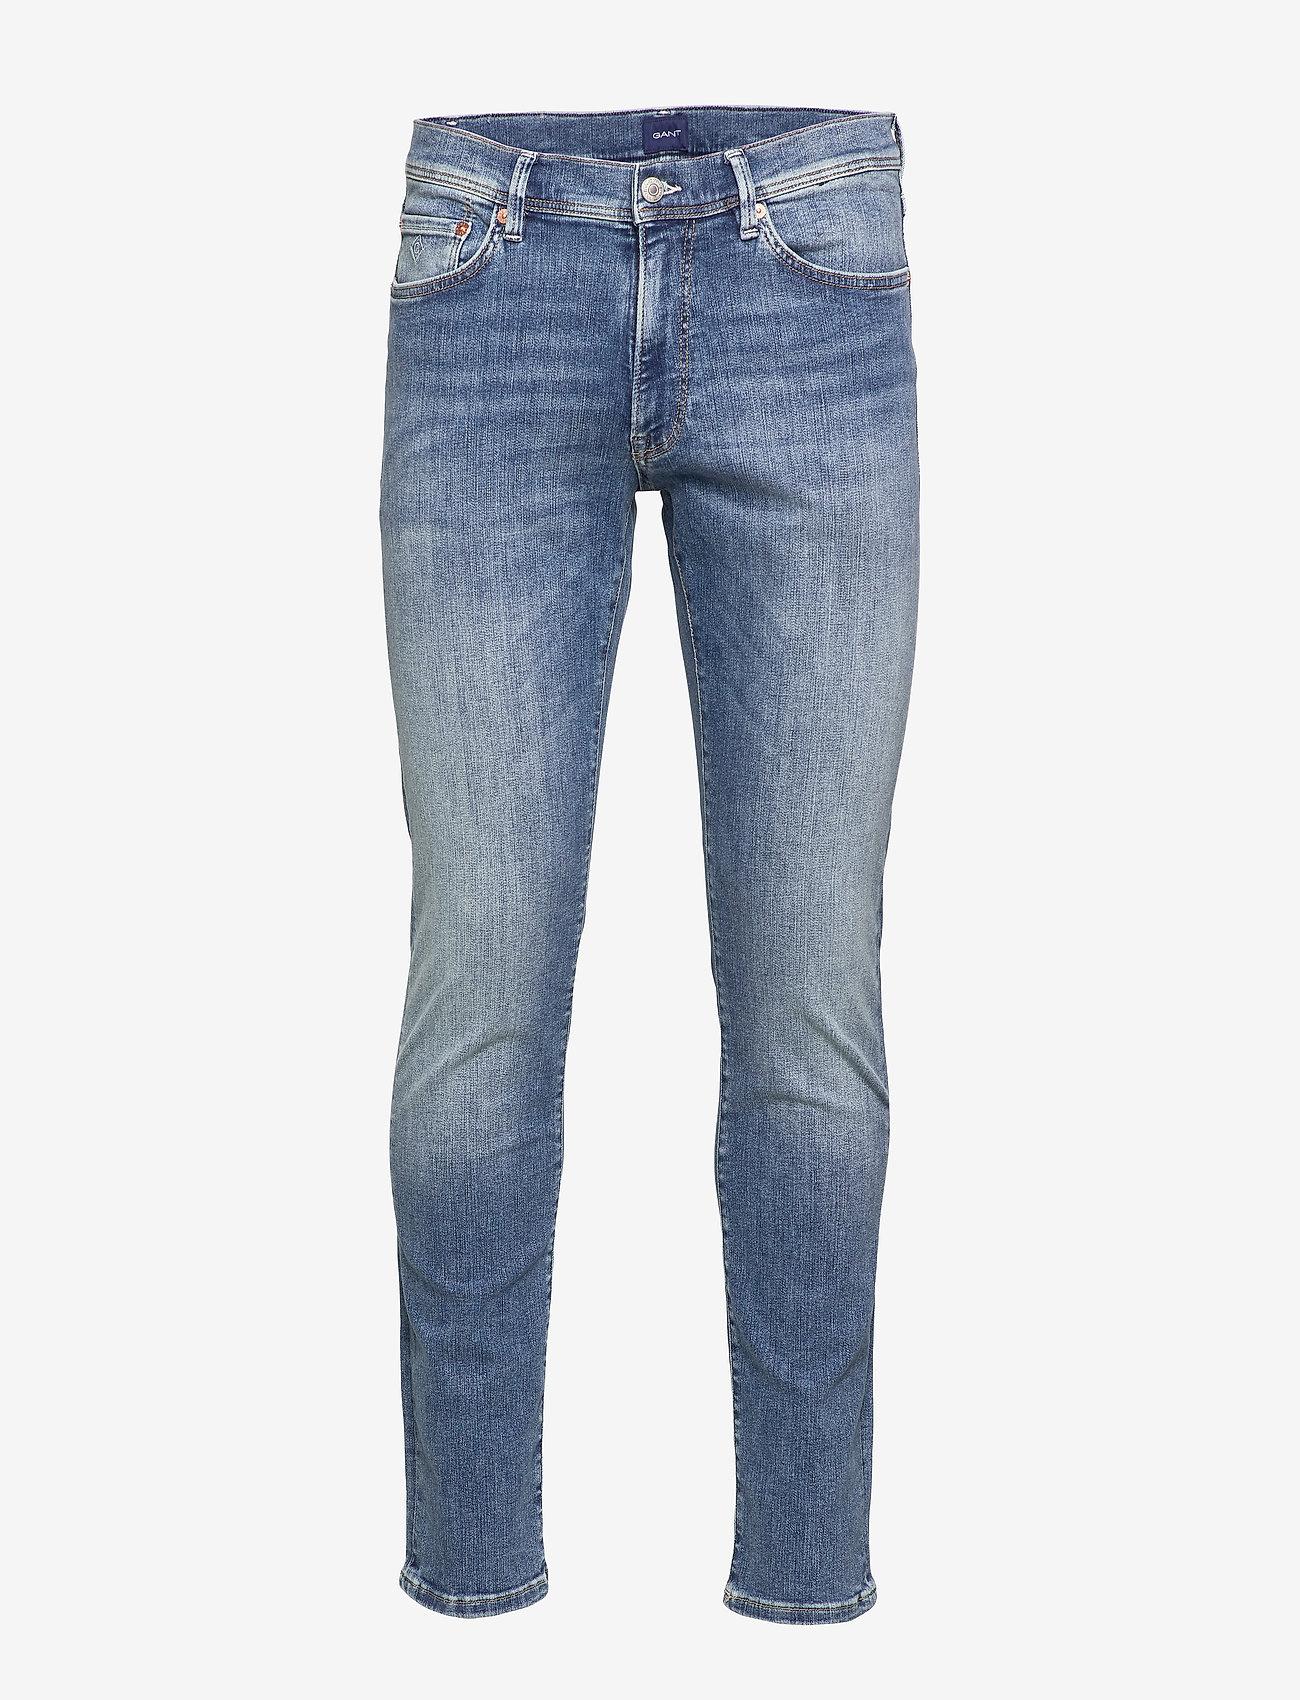 GANT - D1. SLIM ACTIVE-RECOVER JEANS - slim jeans - mid blue vintage - 0